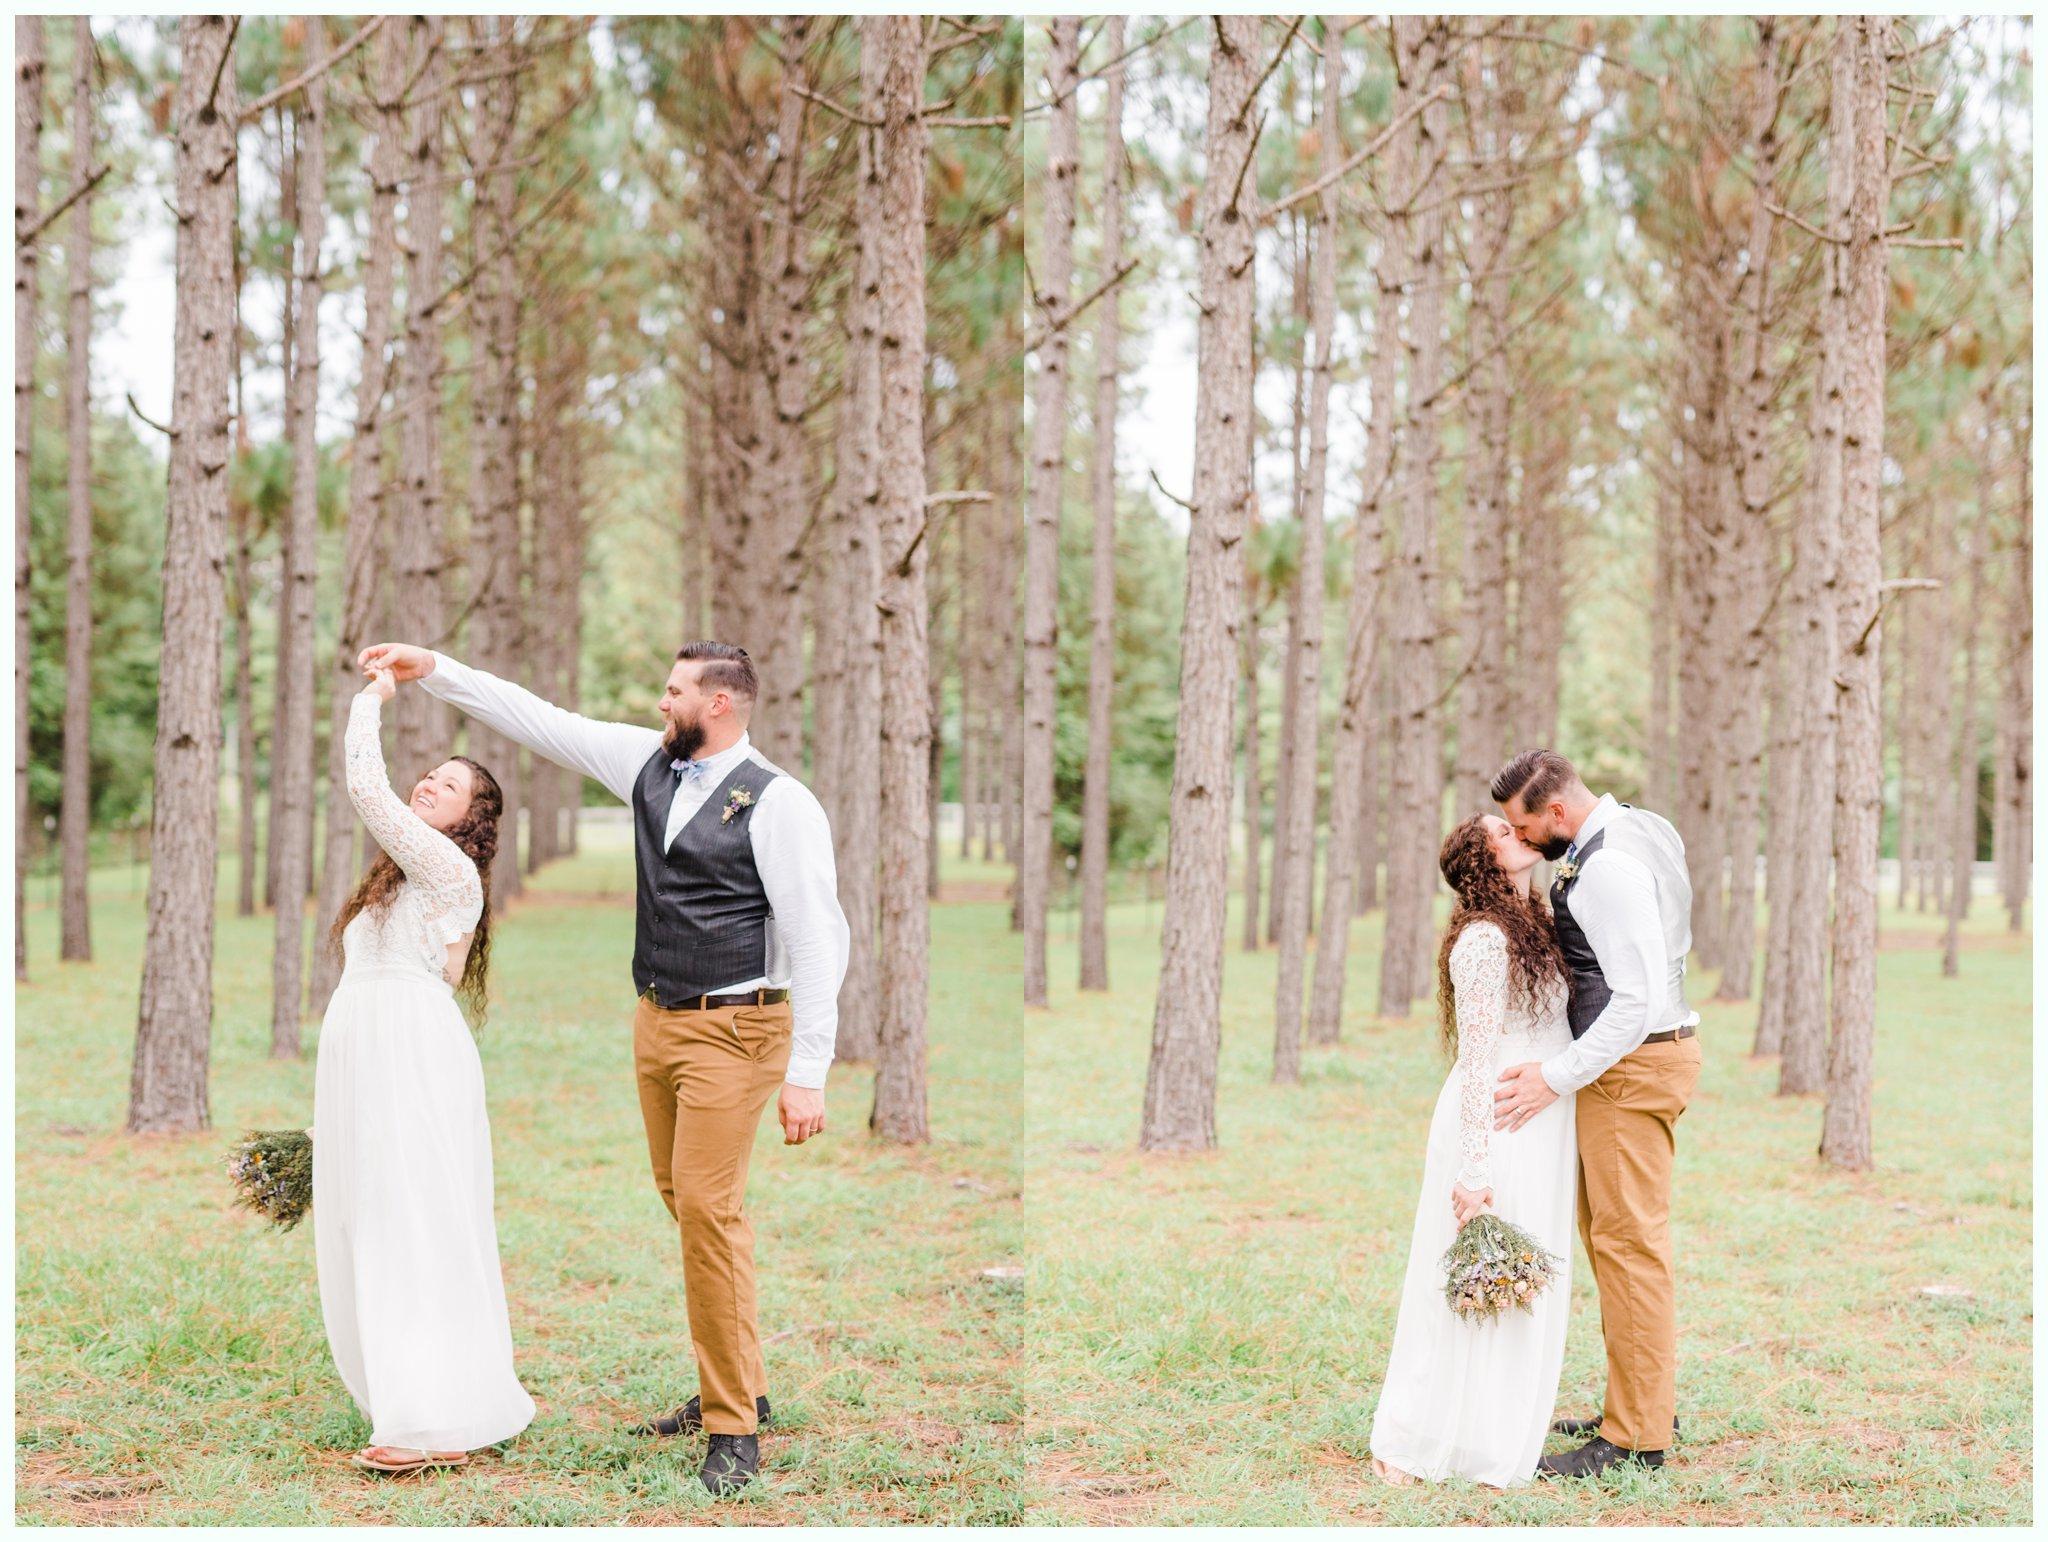 Jake&rhondawedding_5239.jpg